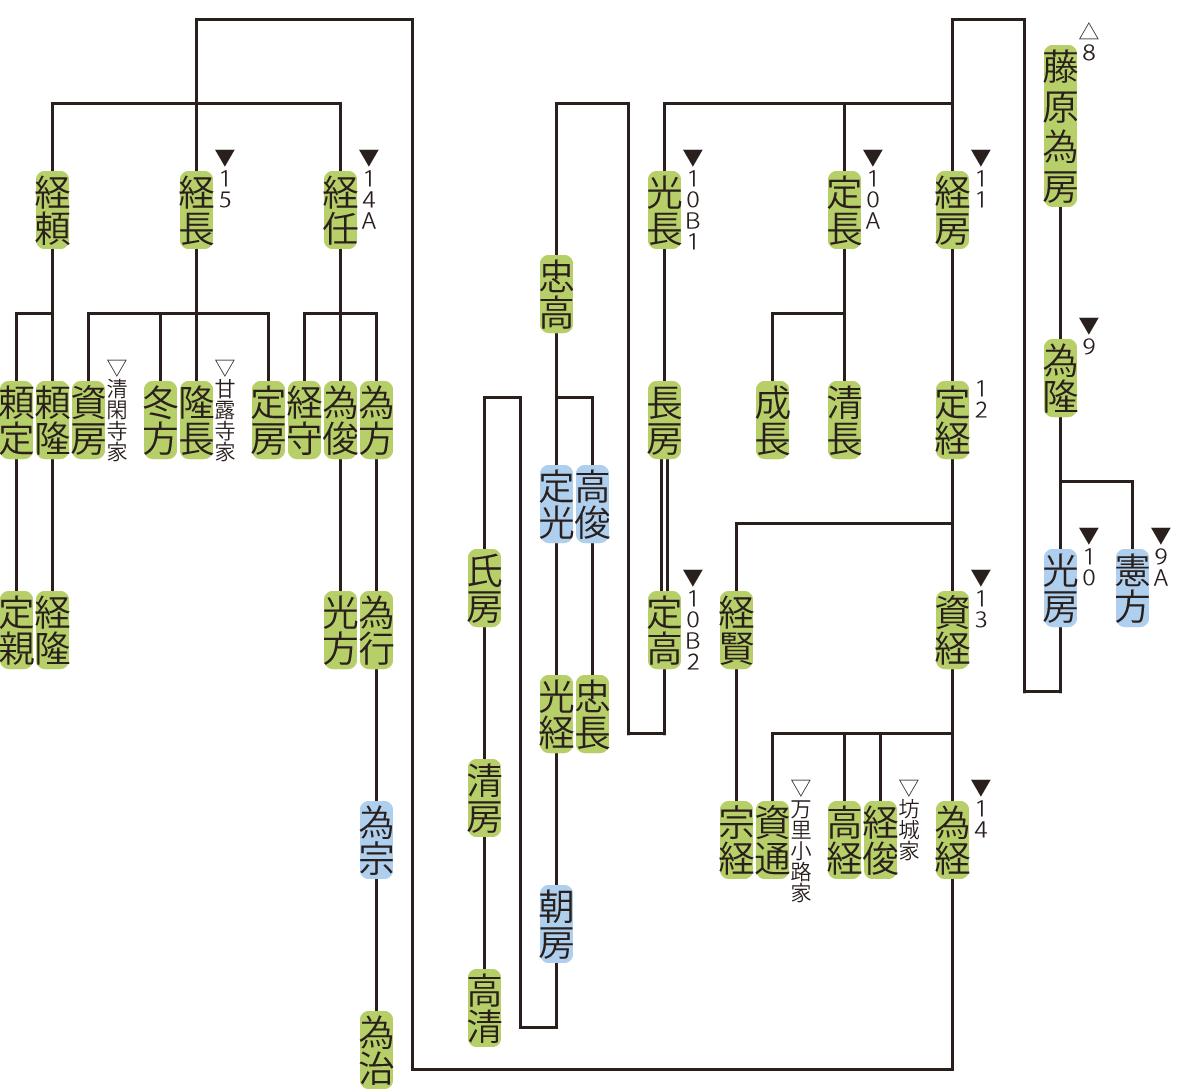 藤原氏北家・高藤流の略系図2